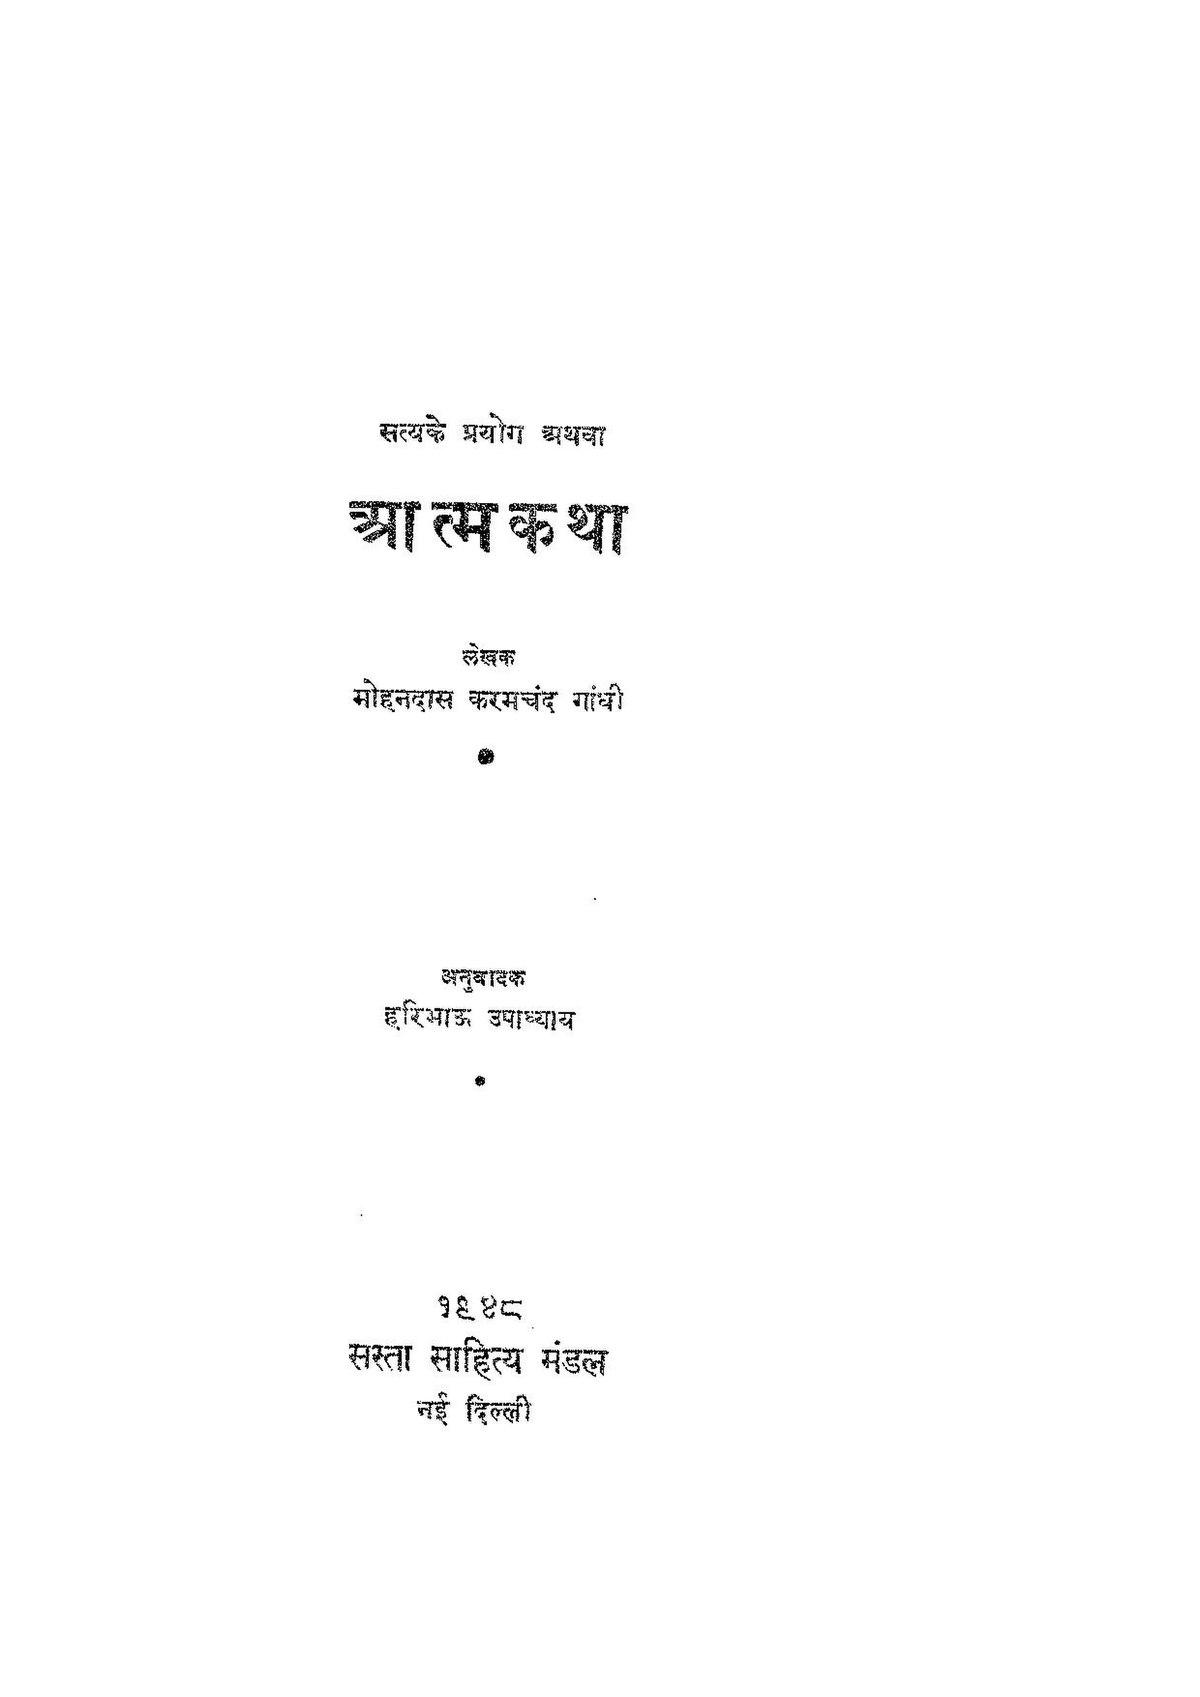 File:Satya Ke Prayog - Mahatma Gandhi pdf - Wikimedia Commons